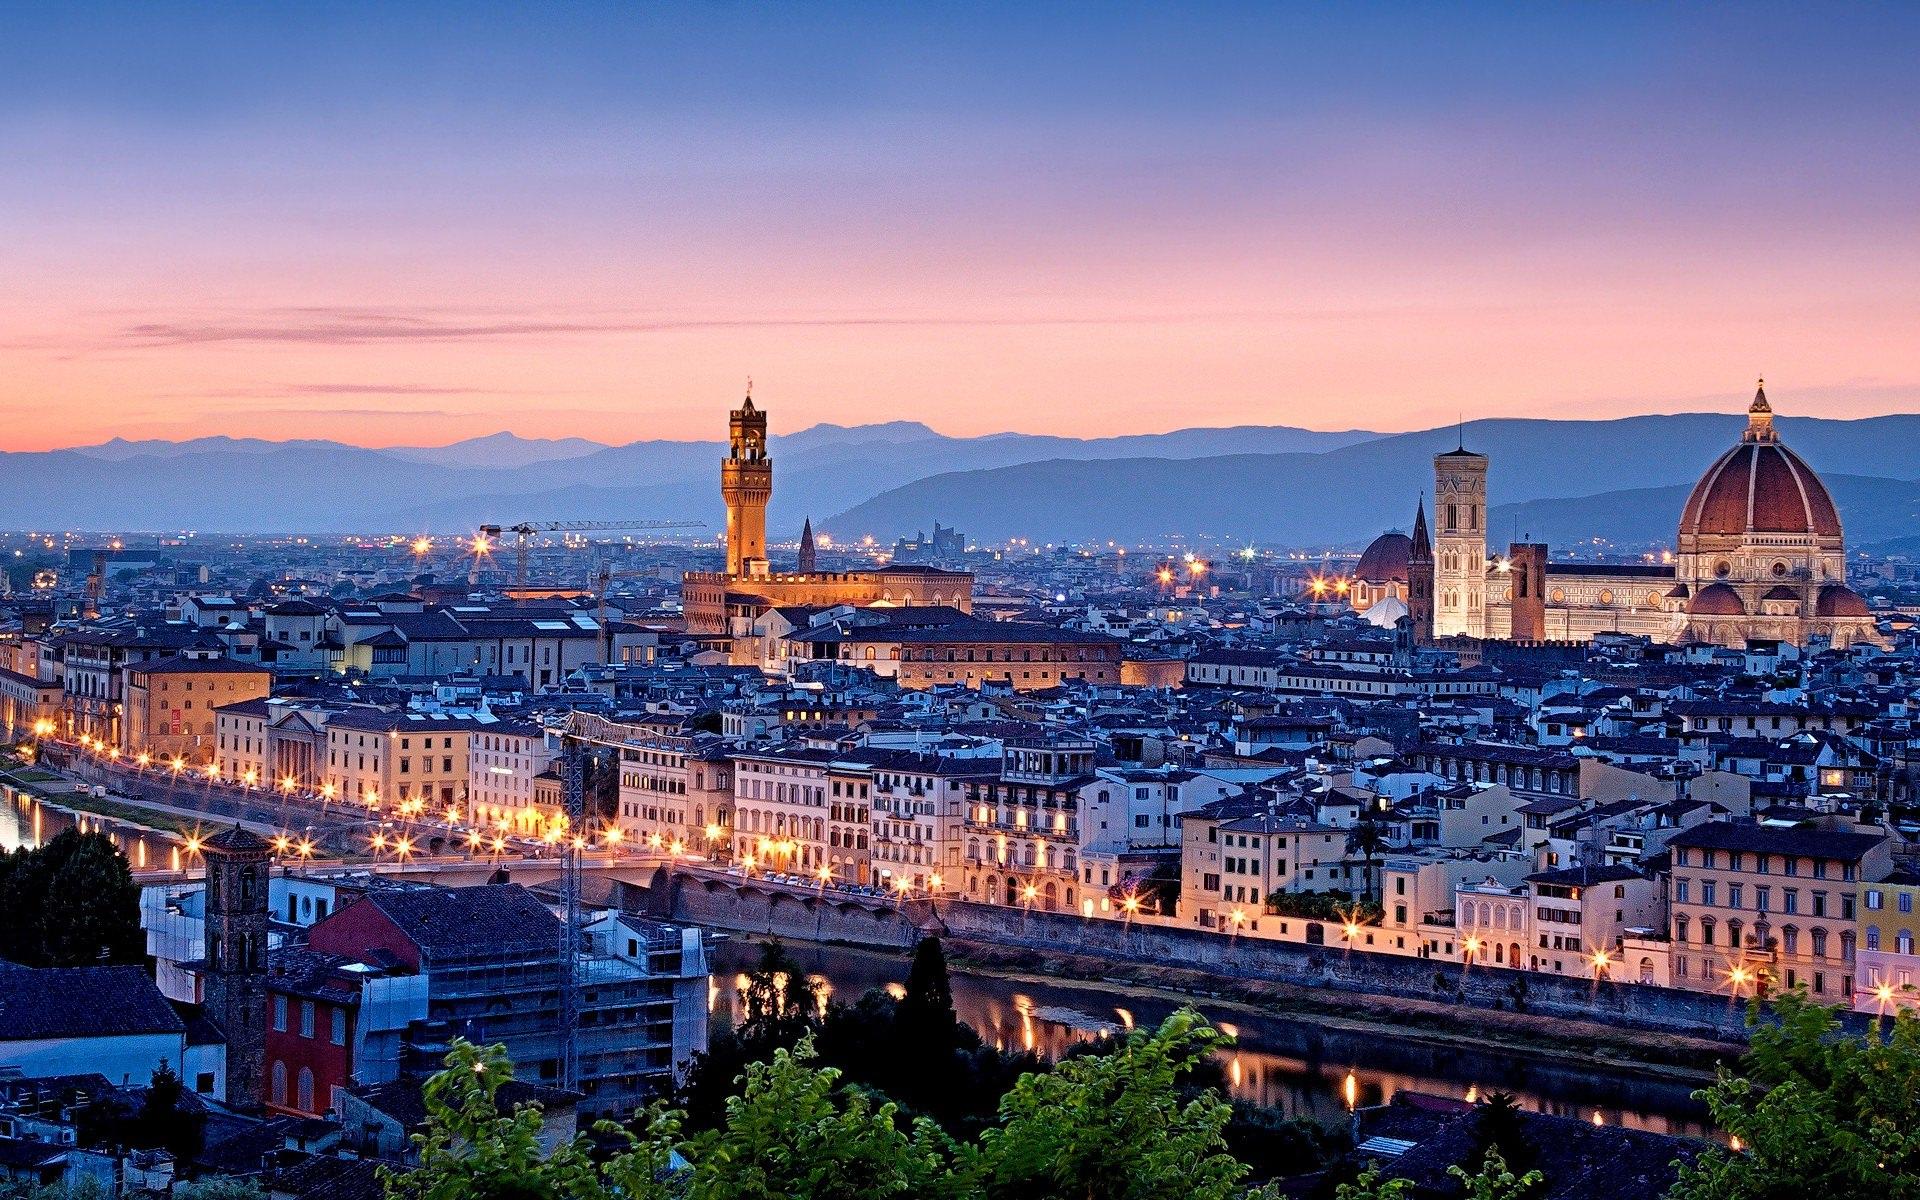 firenca jesenja putovanja evropske metropole gradovi